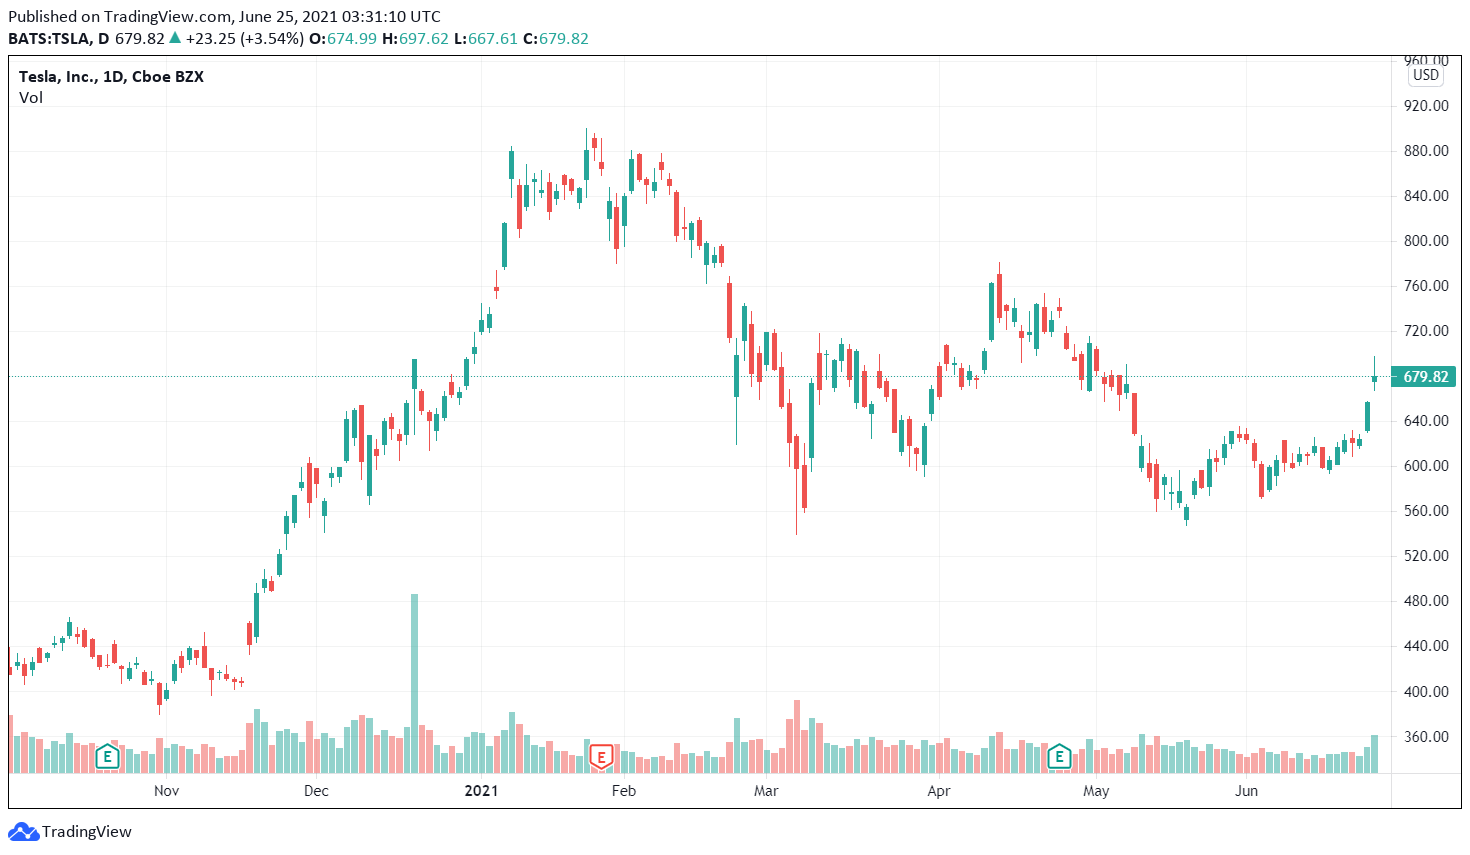 Tesla Inc, one year technical chart performance.